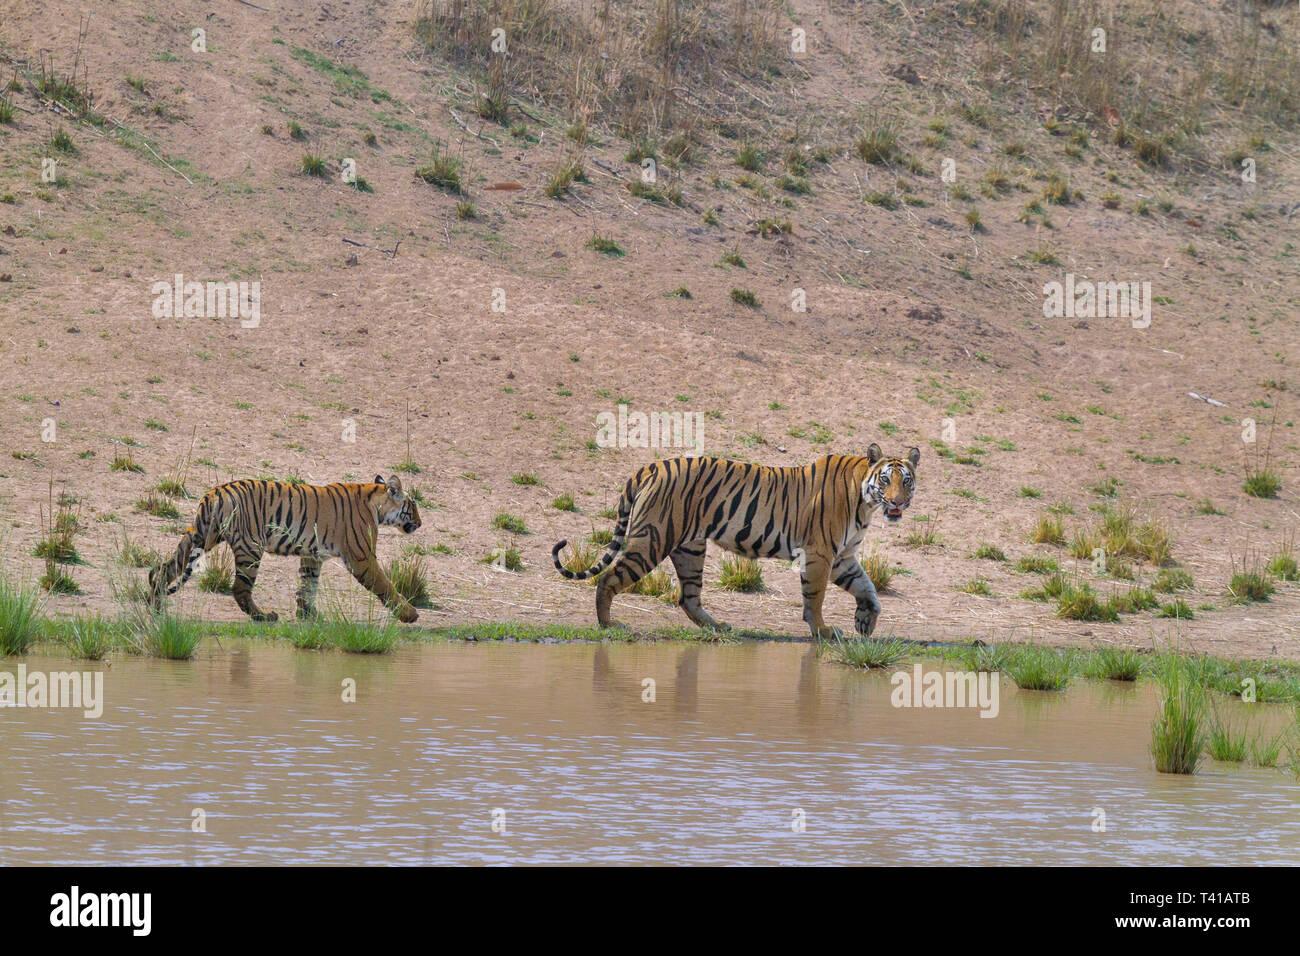 Royal Bengal Tiger or Panthera Tigris or Indian Tiger mother and her cub beside water body at Bandhavgarh National Park,Madhyapradesh India. - Stock Image